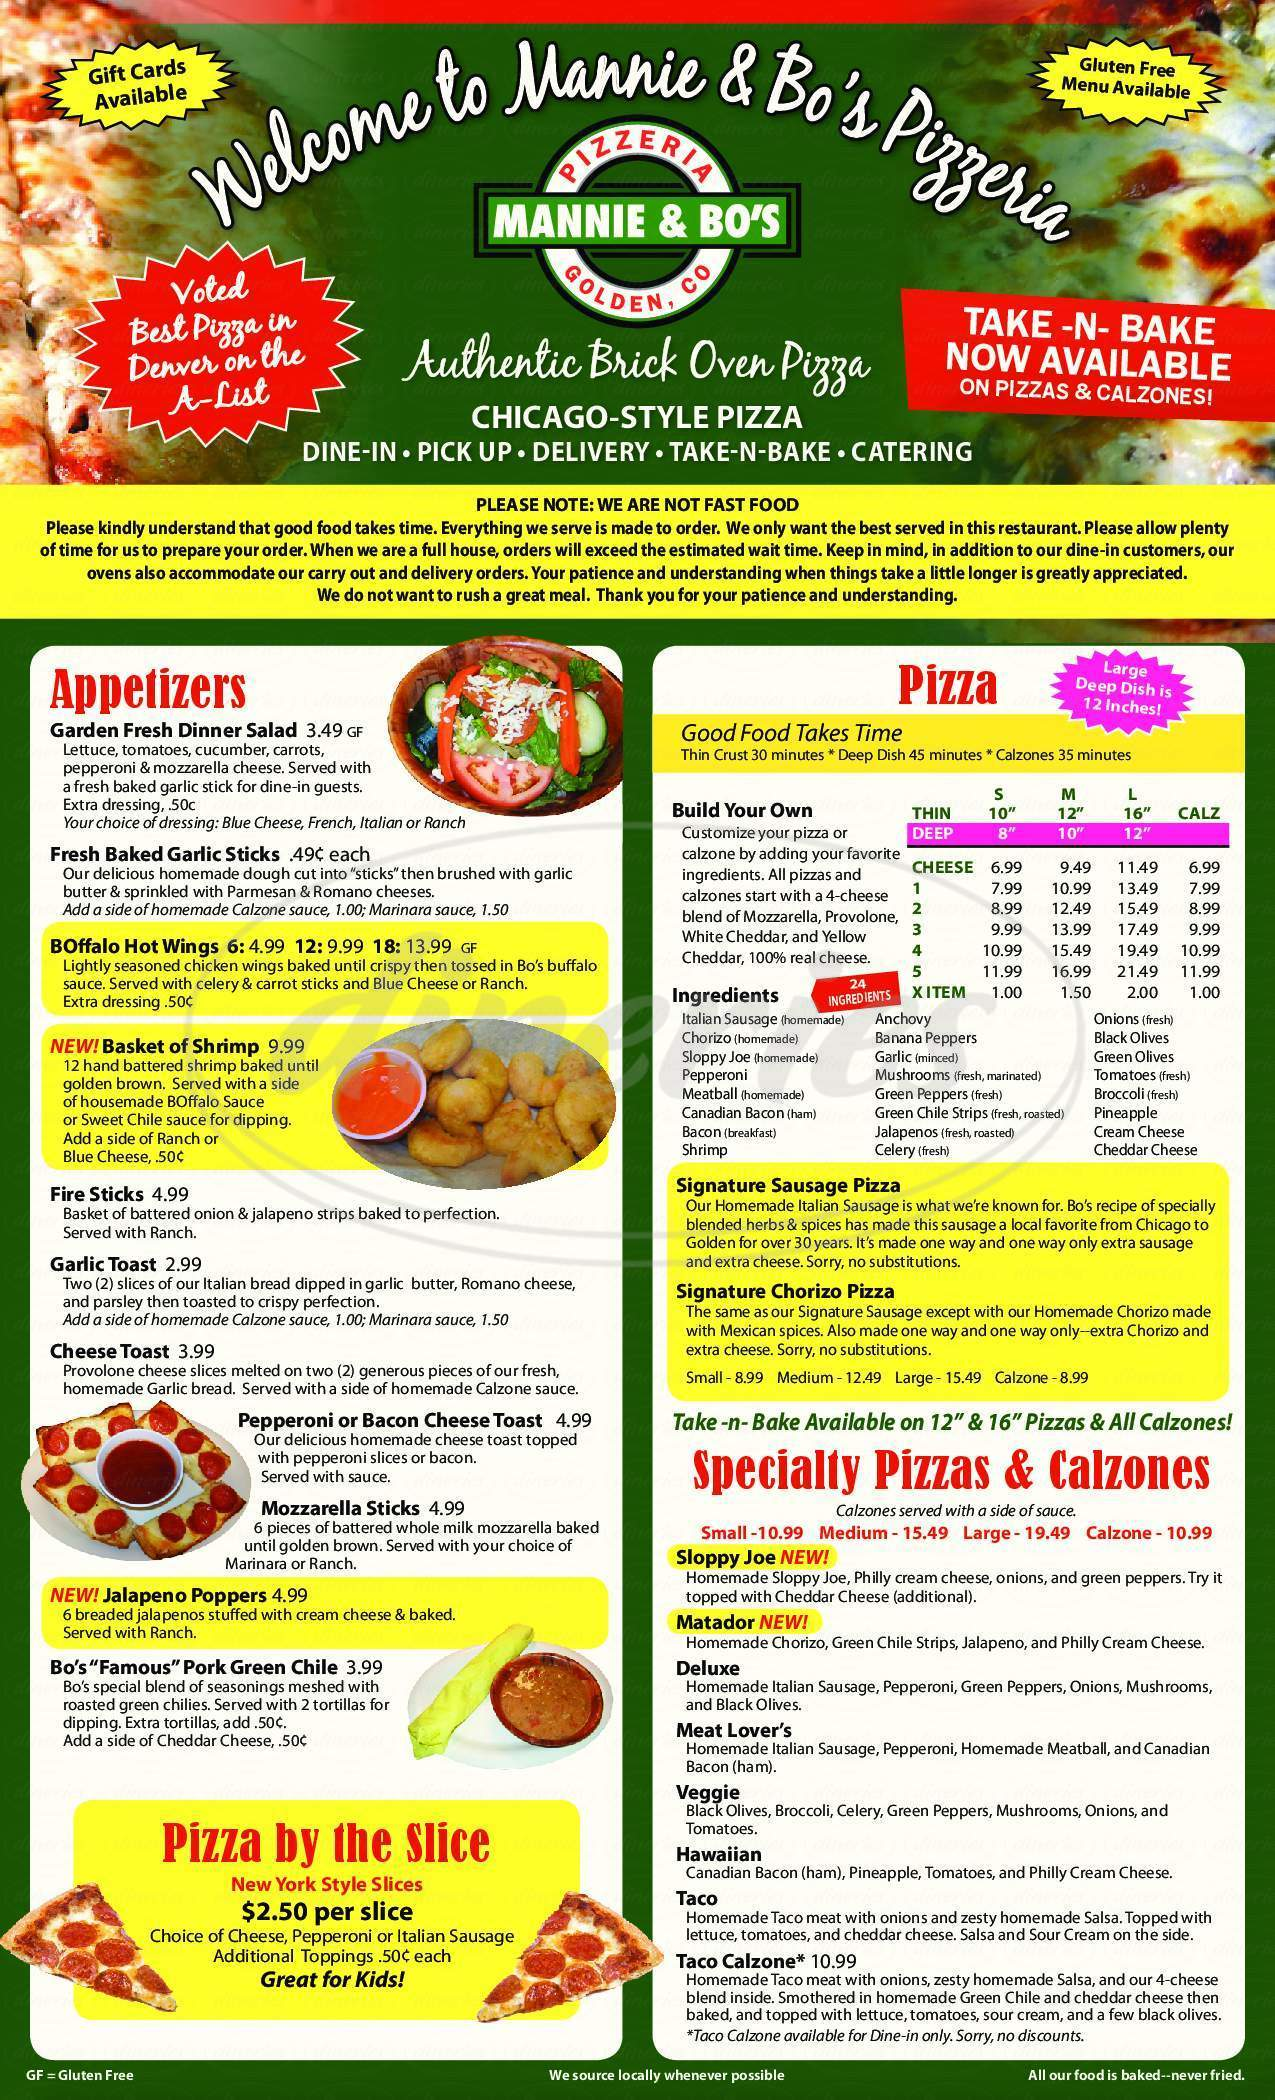 menu for Mannie & Bo's Pizzeria